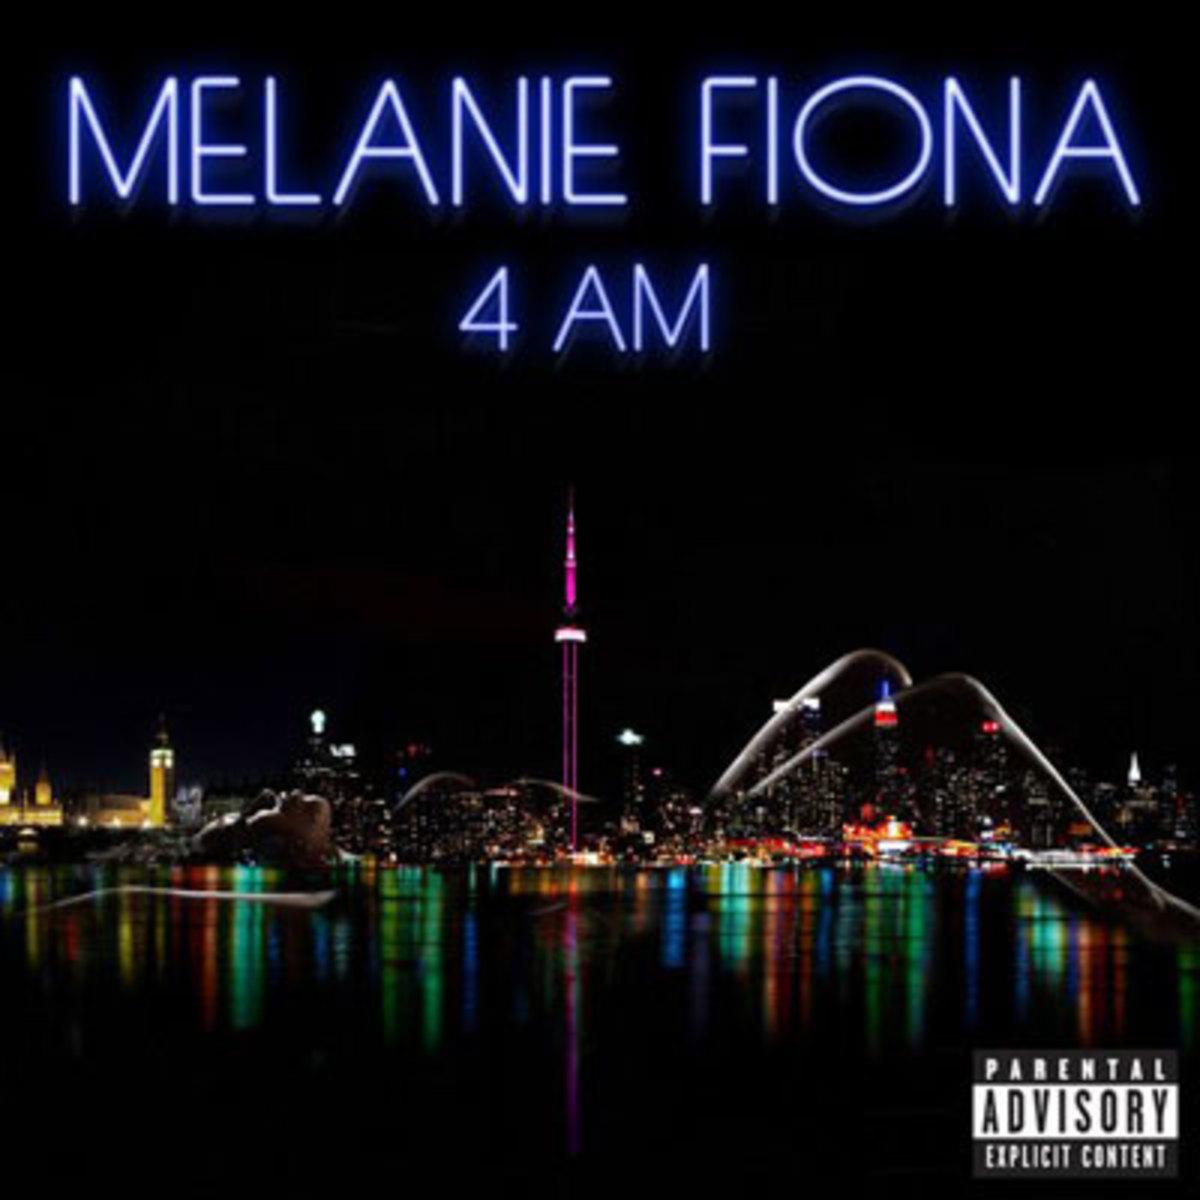 melaniefiona-4am.jpg